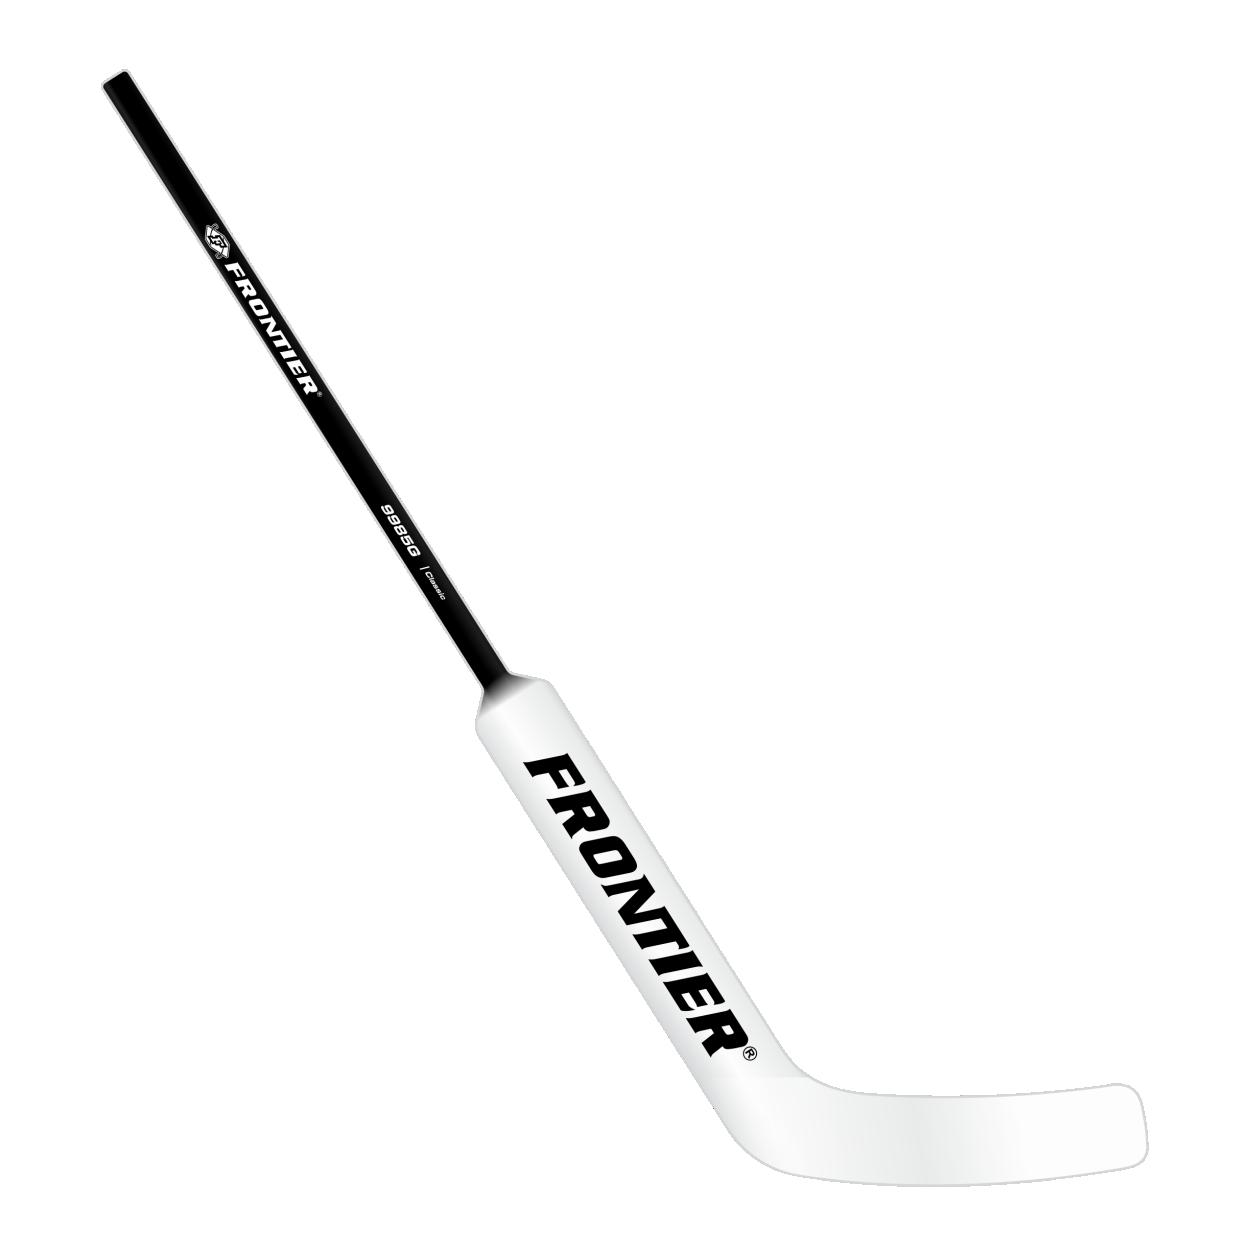 9985g Classic Frontier Goalie Stick